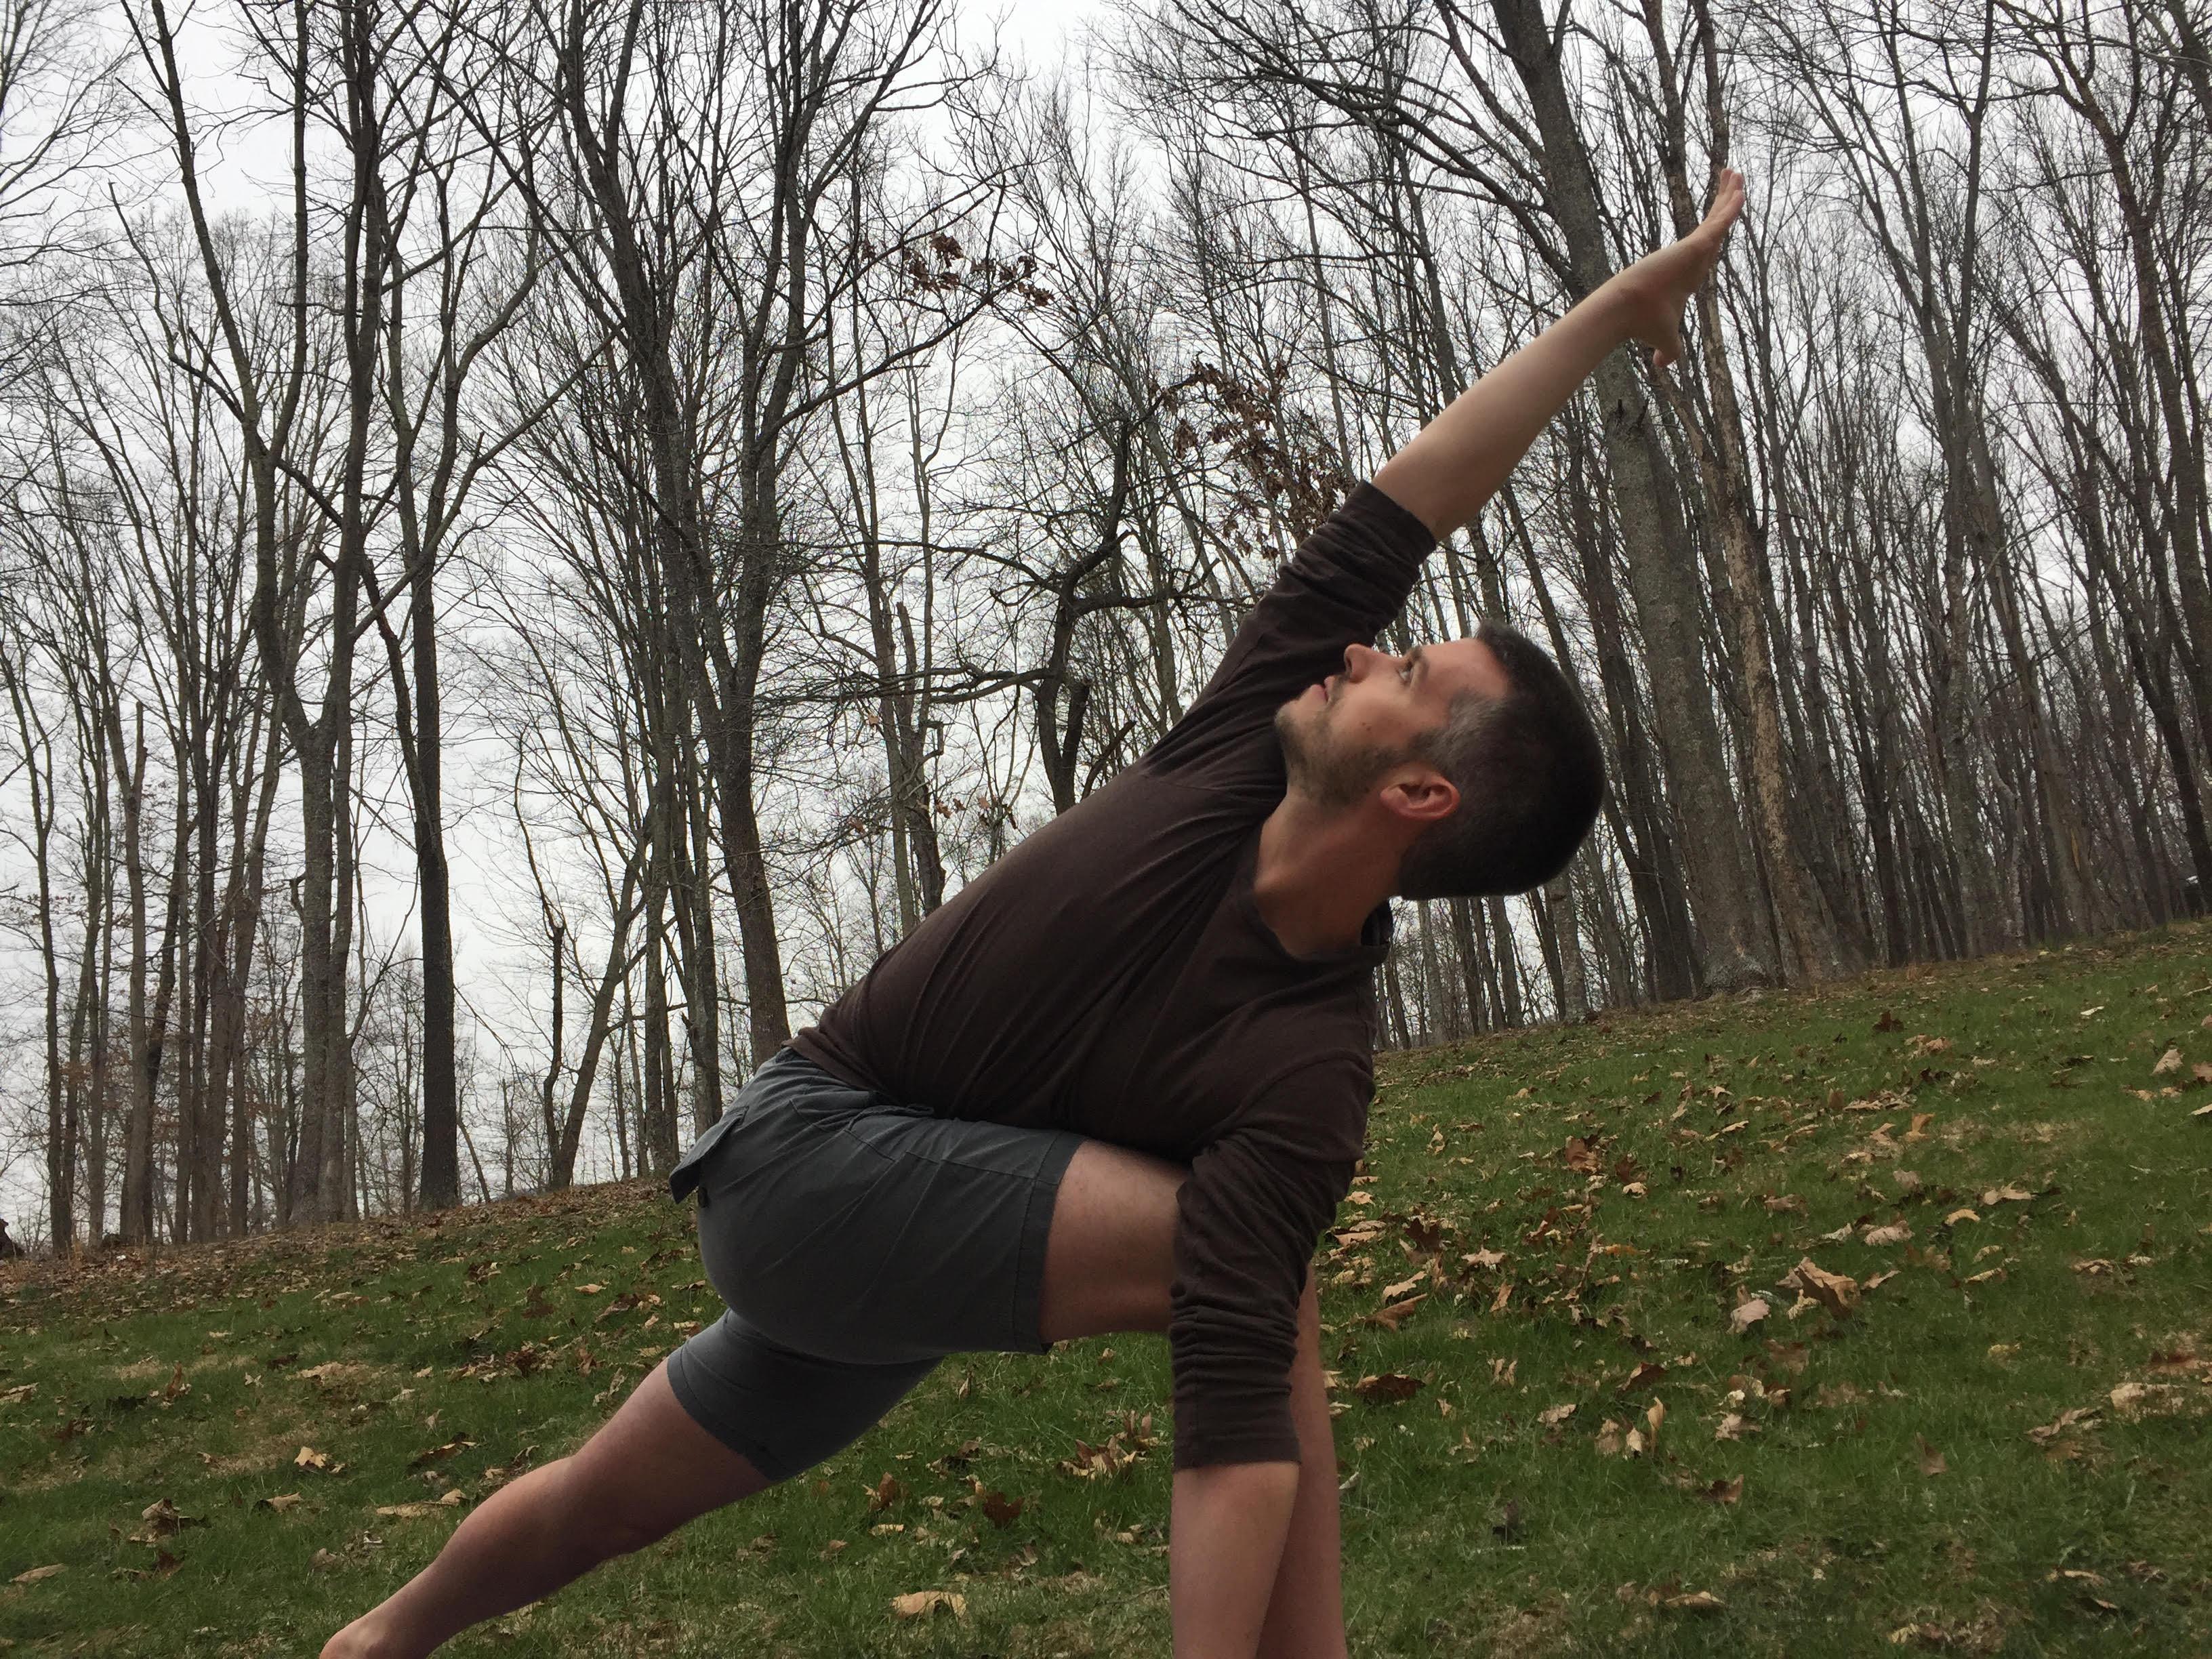 Hatha Yoga Monday @ 6:15 p.m.